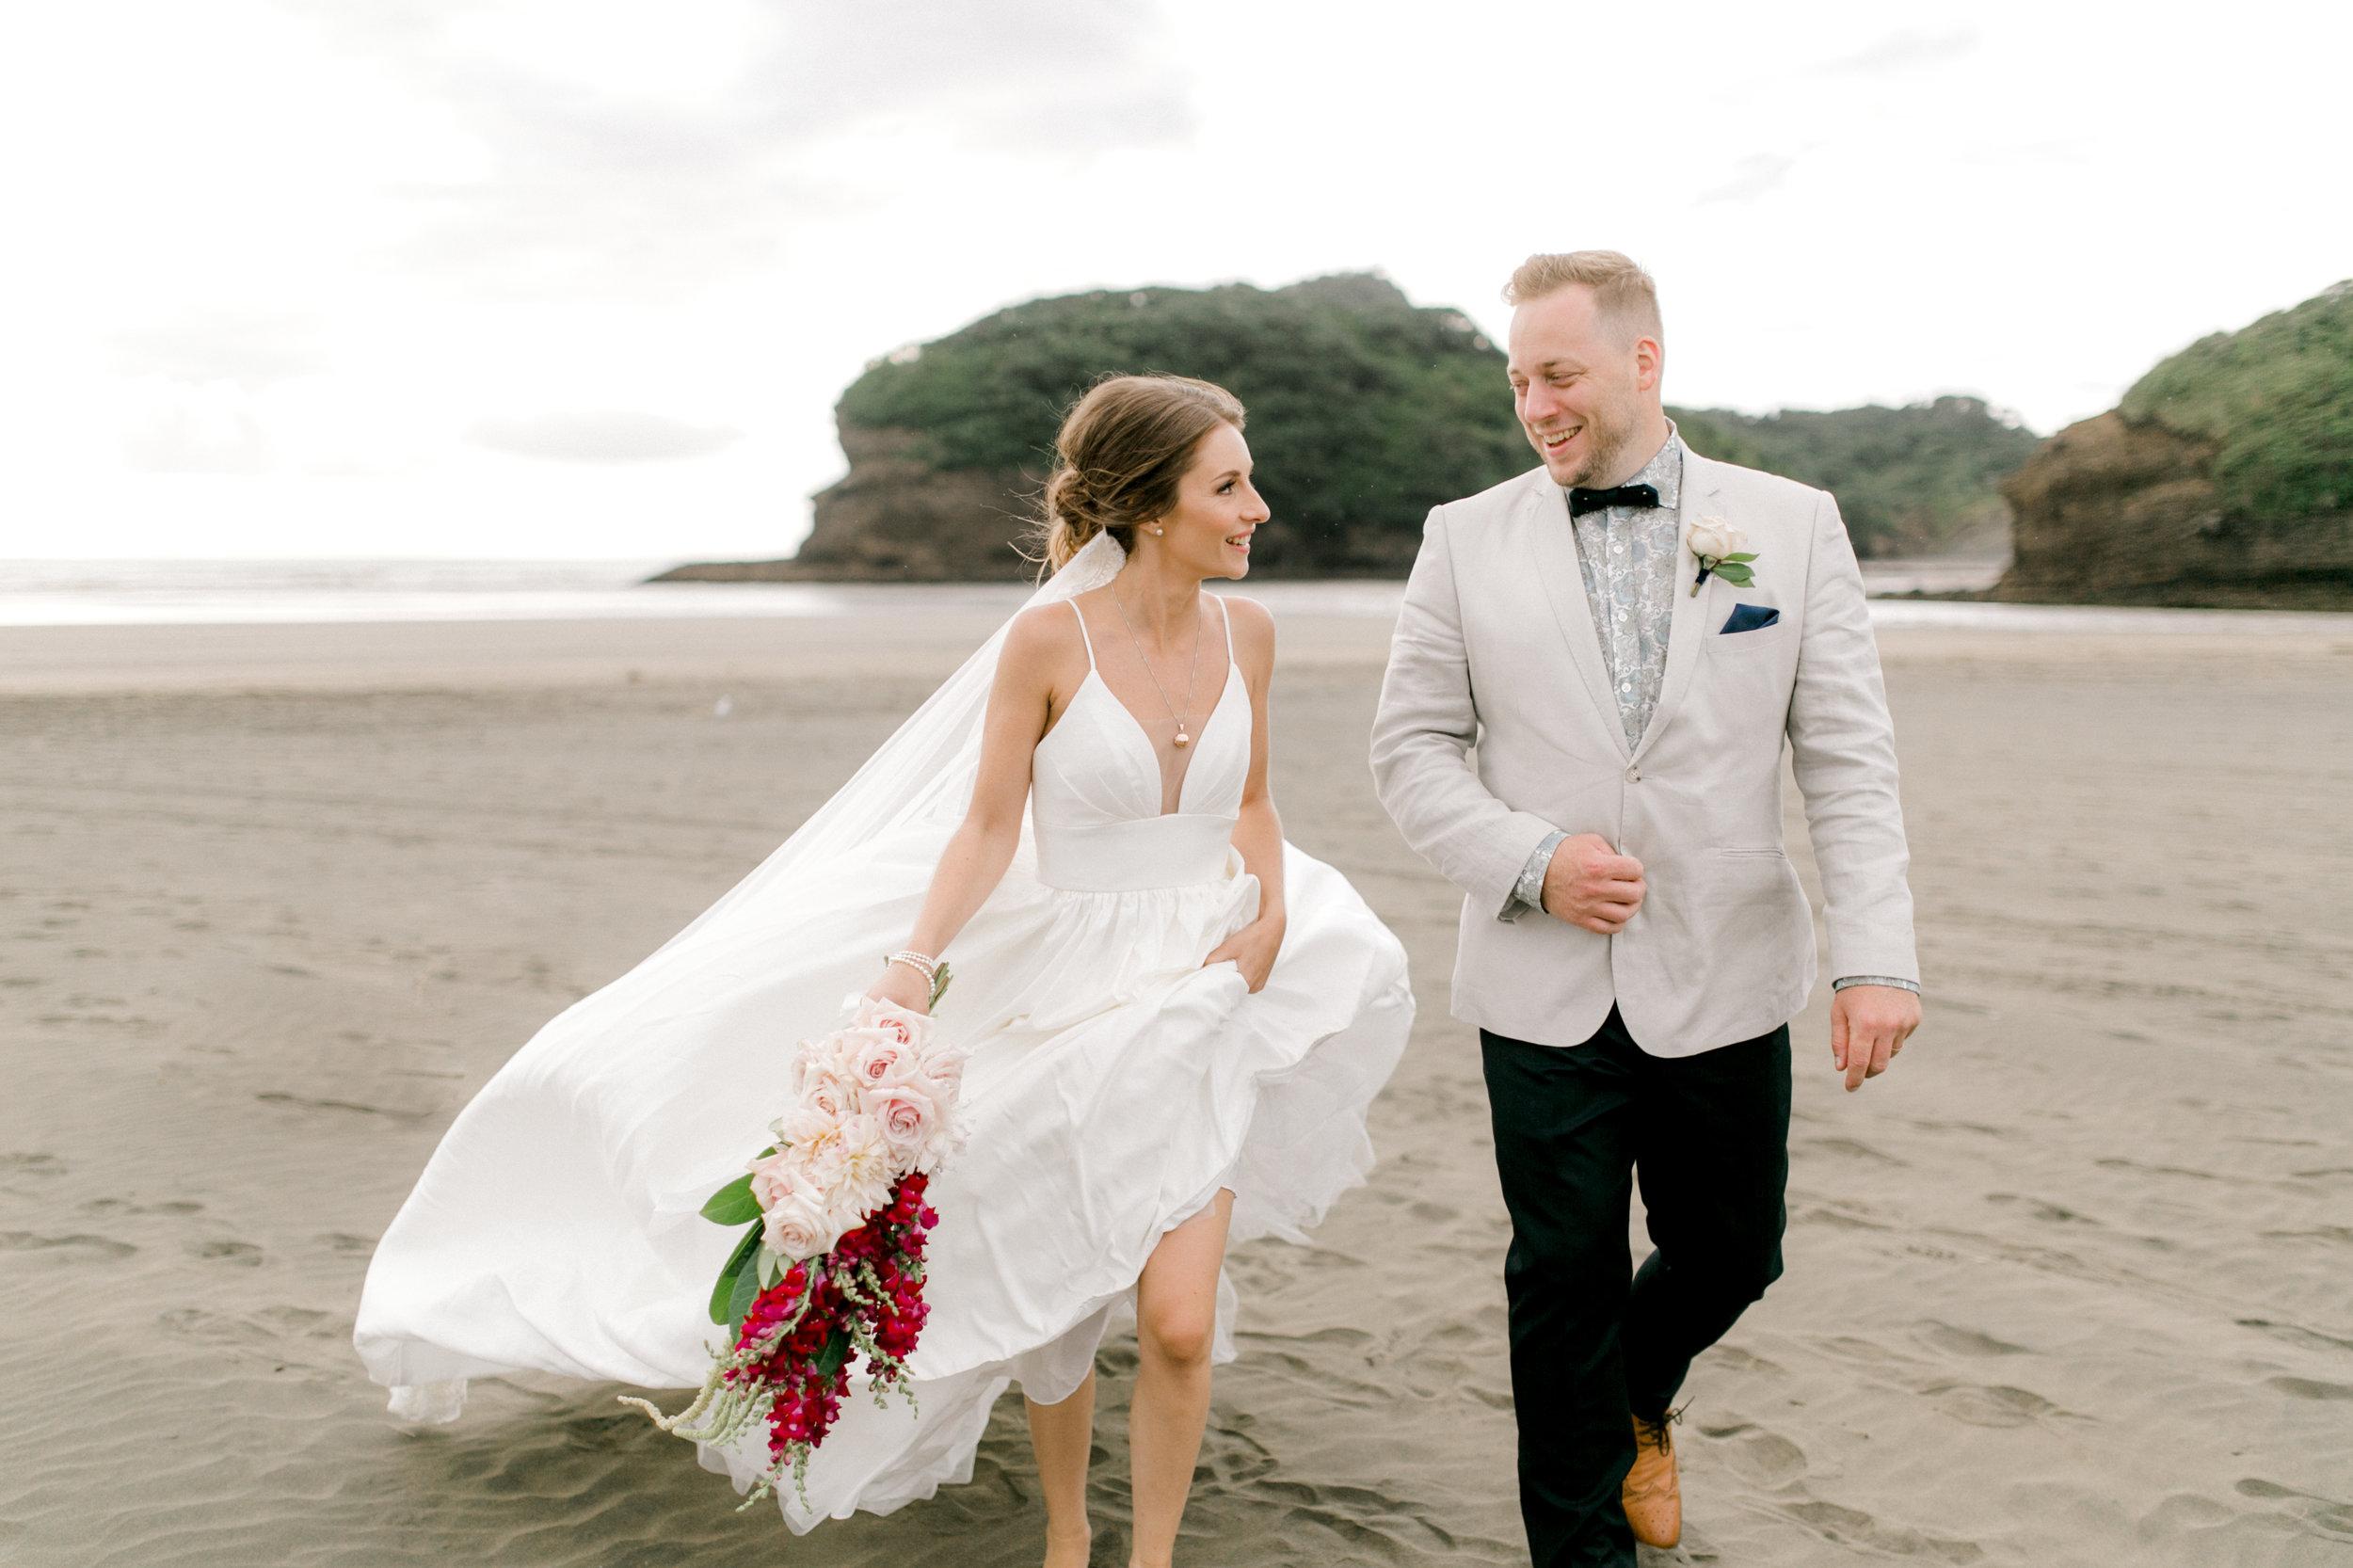 phil and imi wedding wedding © Sweet Events Photography 2018-8604 - emma keirle.jpg